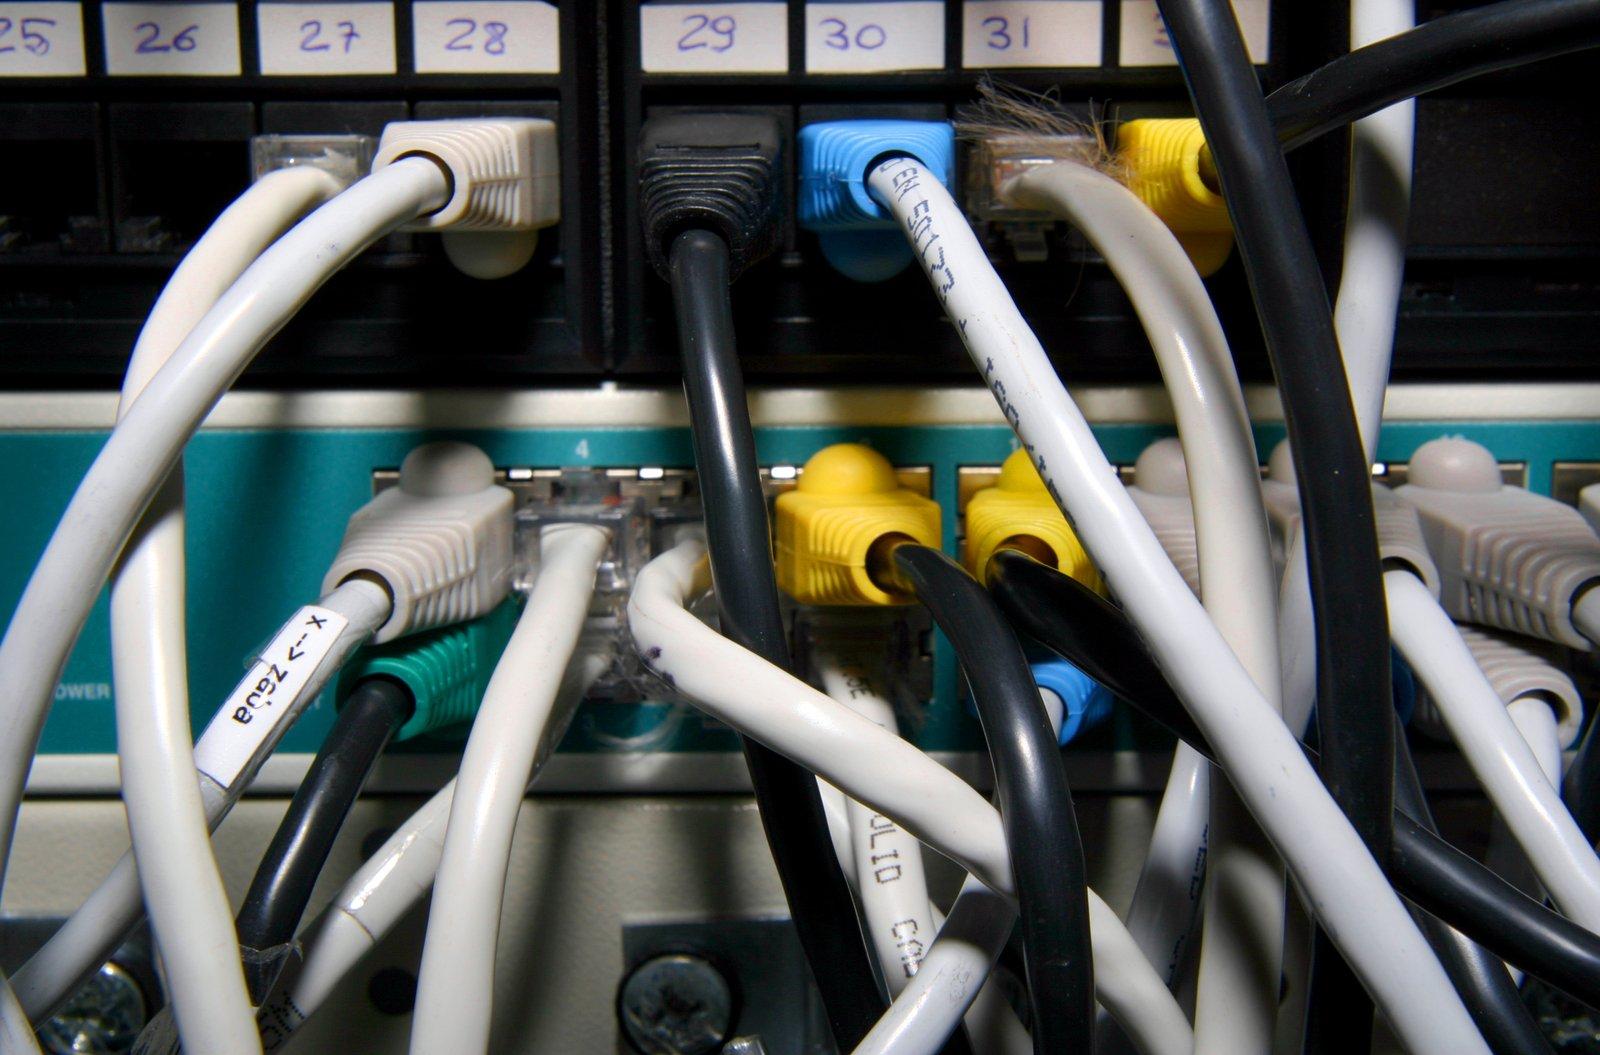 cable,server,hub,computer